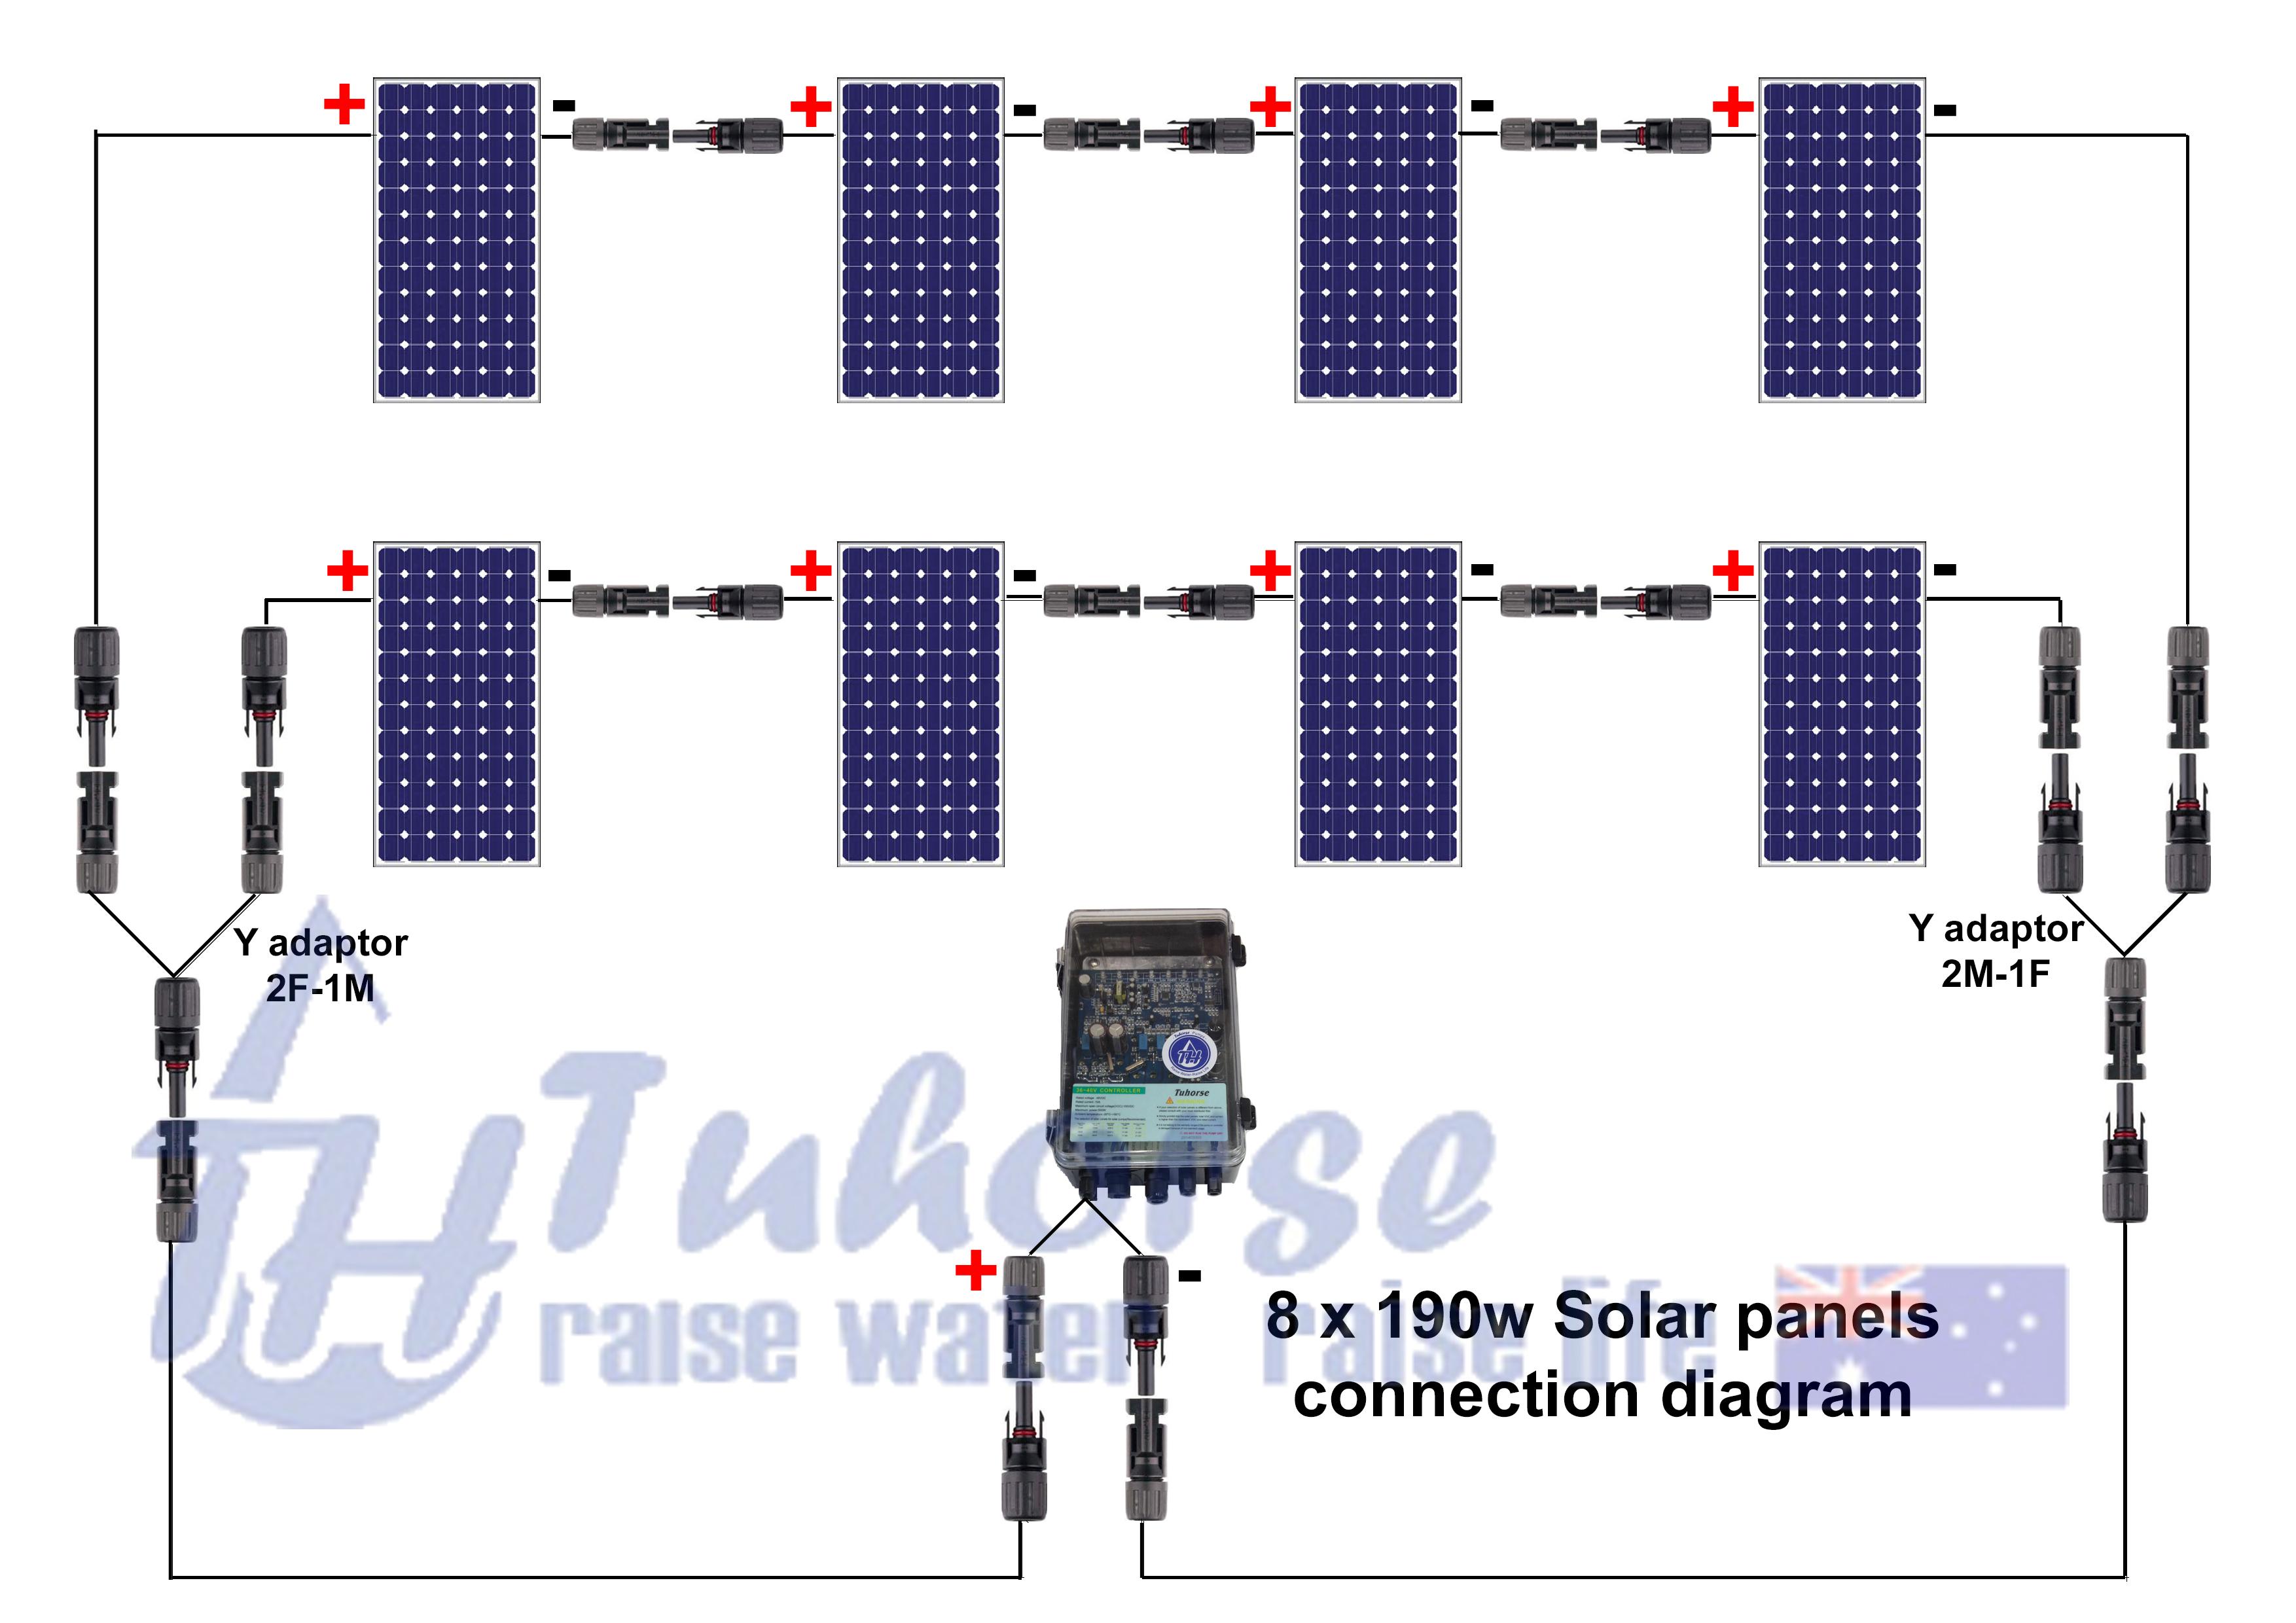 hight resolution of solar panel system wiring diagram midnight box wiring diagram solar inverter wiring diagram solar panel wiring diagram uk